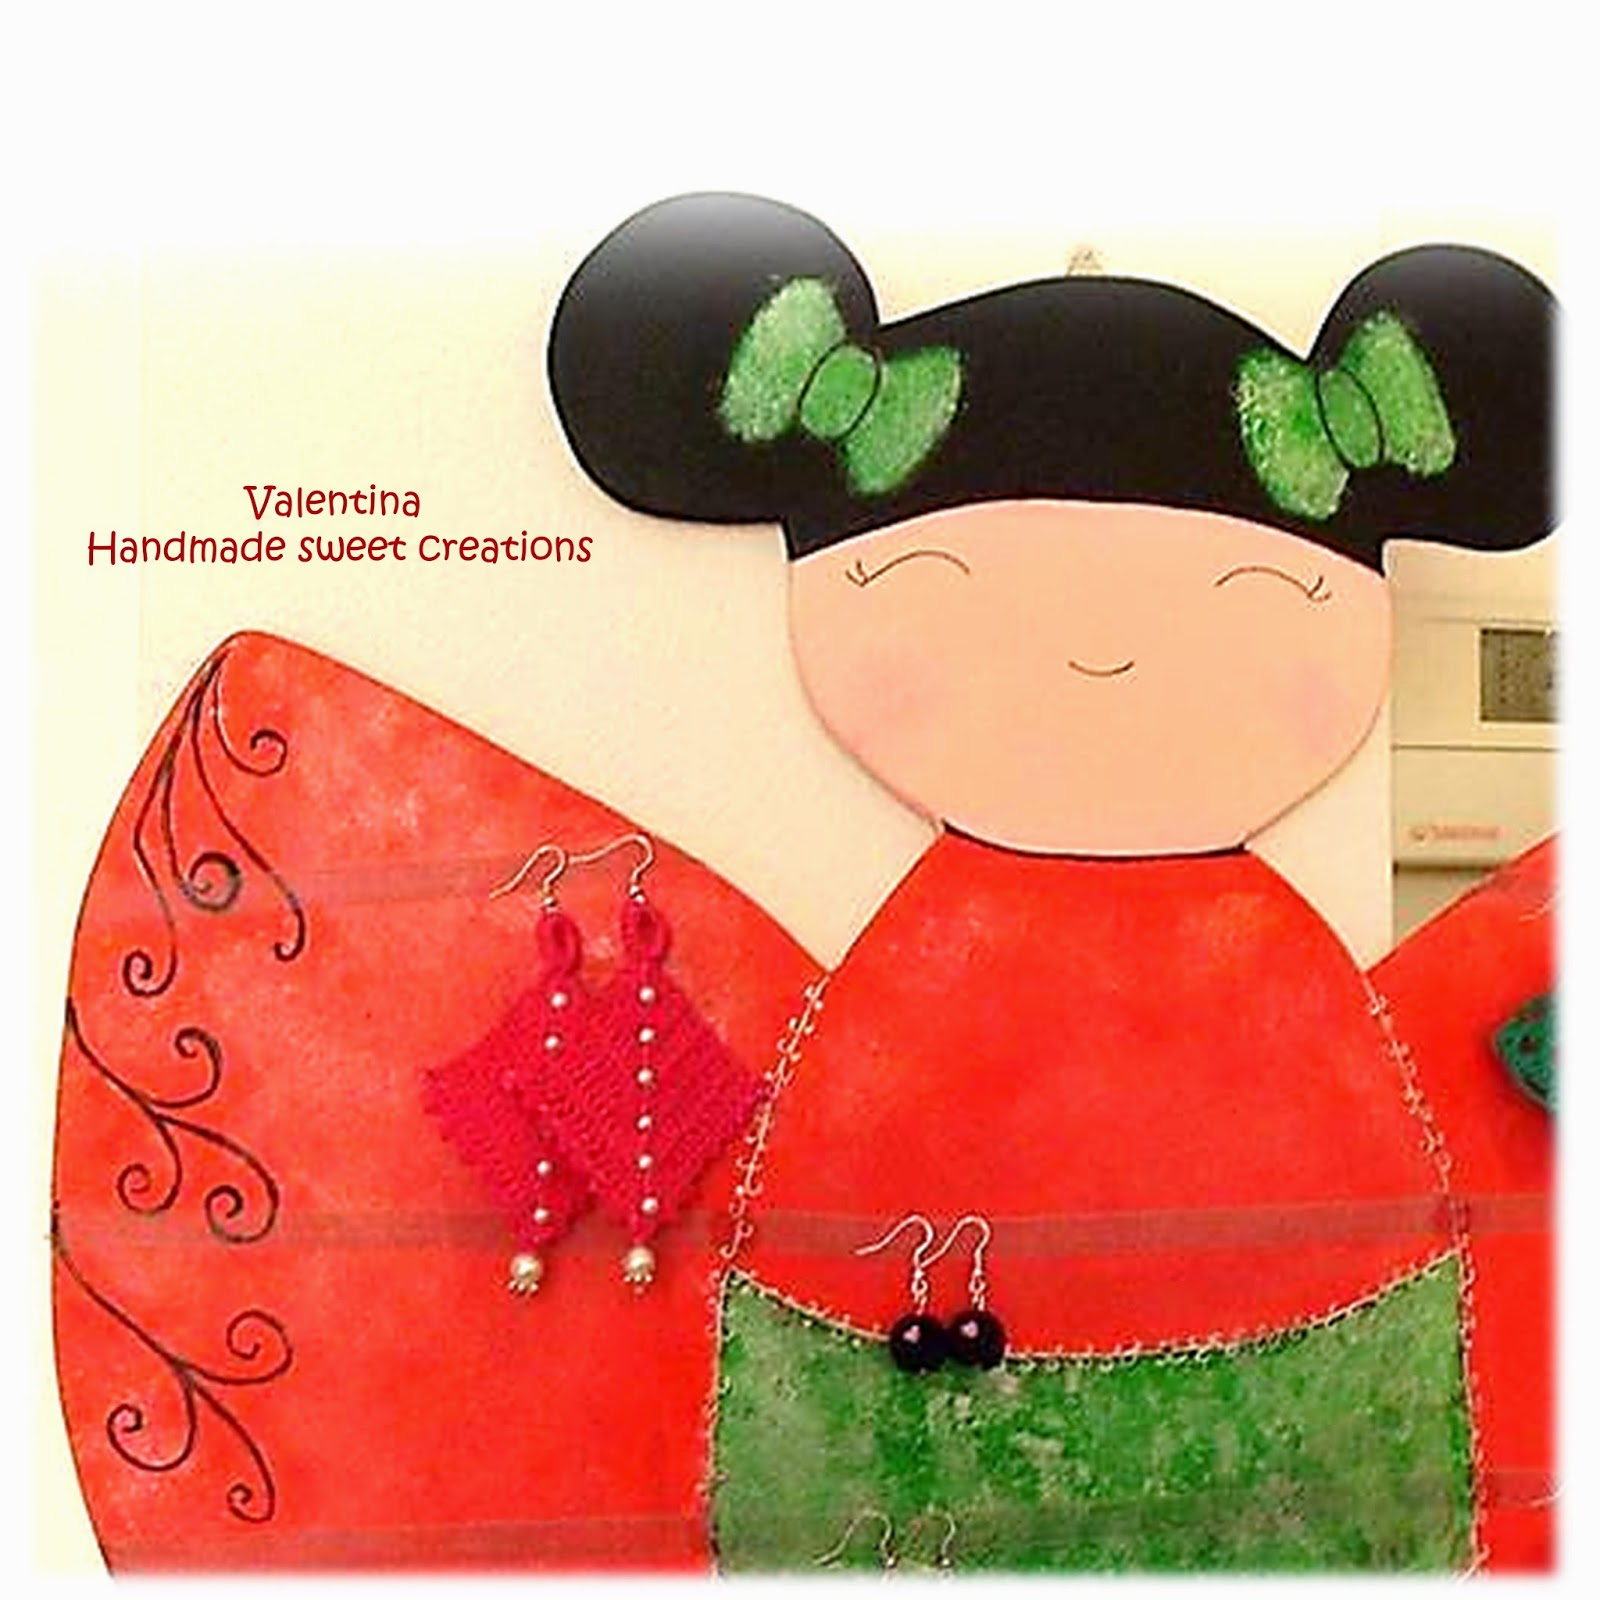 Porta Orecchini Da Parete valentina handmade sweet creations: espositore